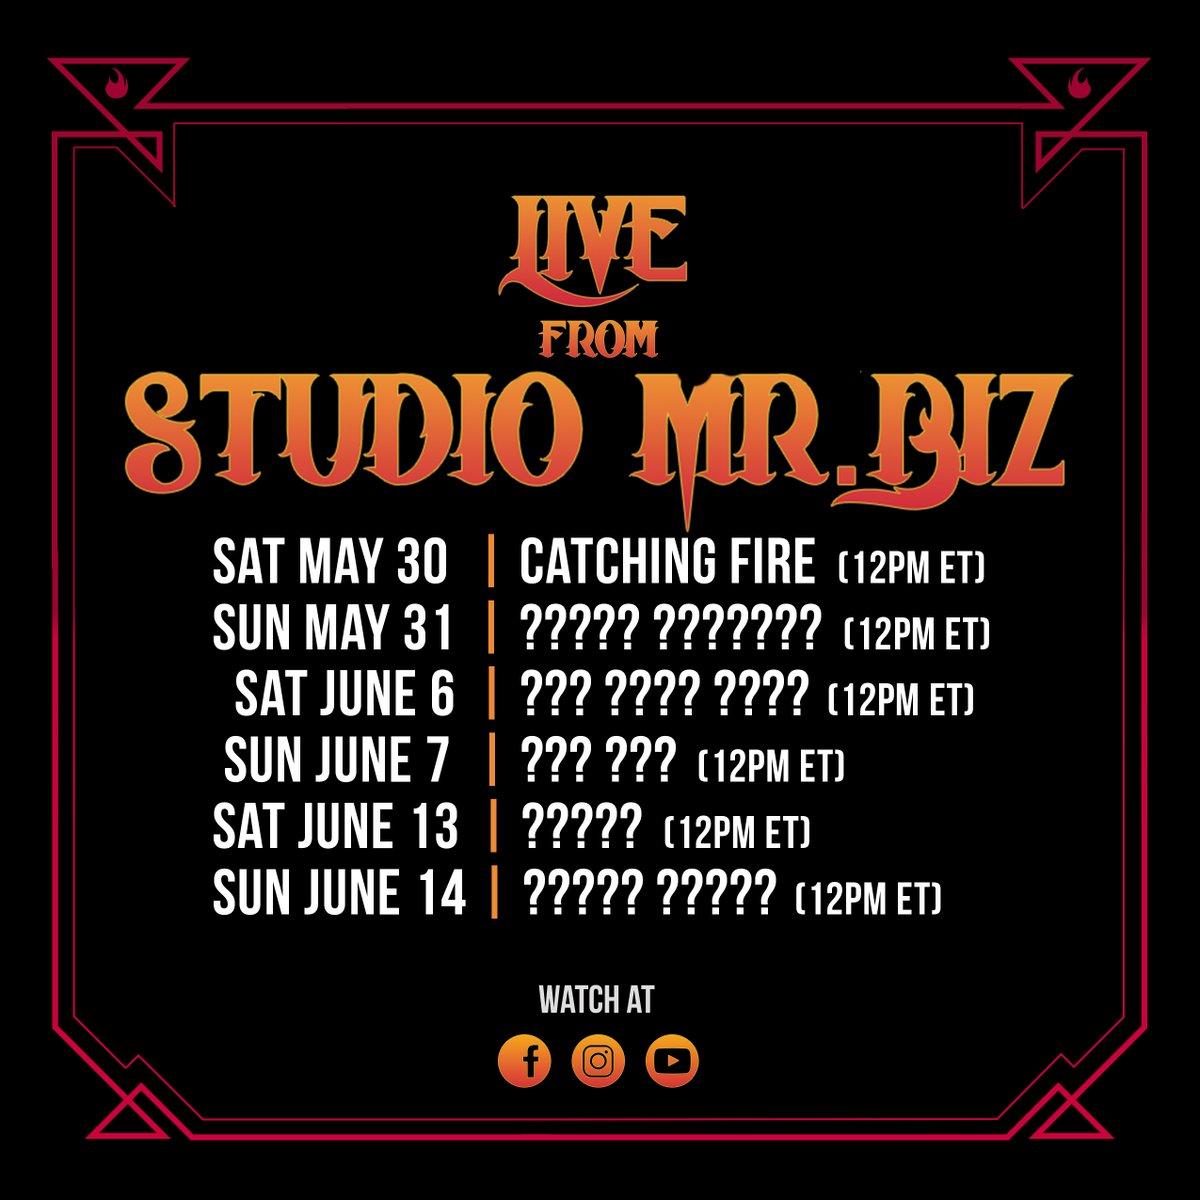 Live from Studio Mr. Biz   Upcoming Events https://t.co/efd2ICvOrg